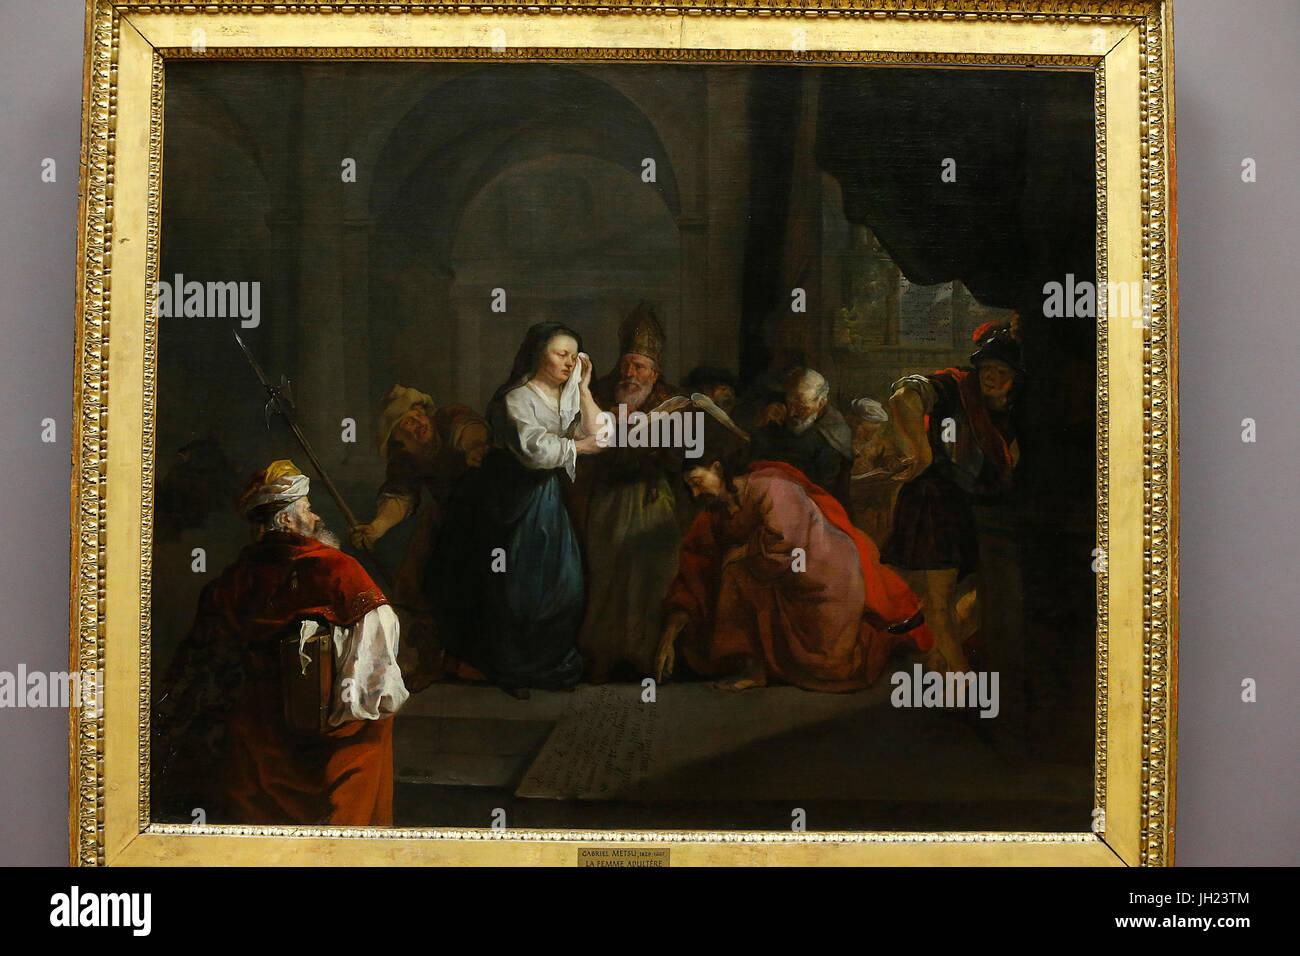 Louvre museum. Jesus defending the adultress. Gabriel Metsu. 1653. France. France. Stock Photo